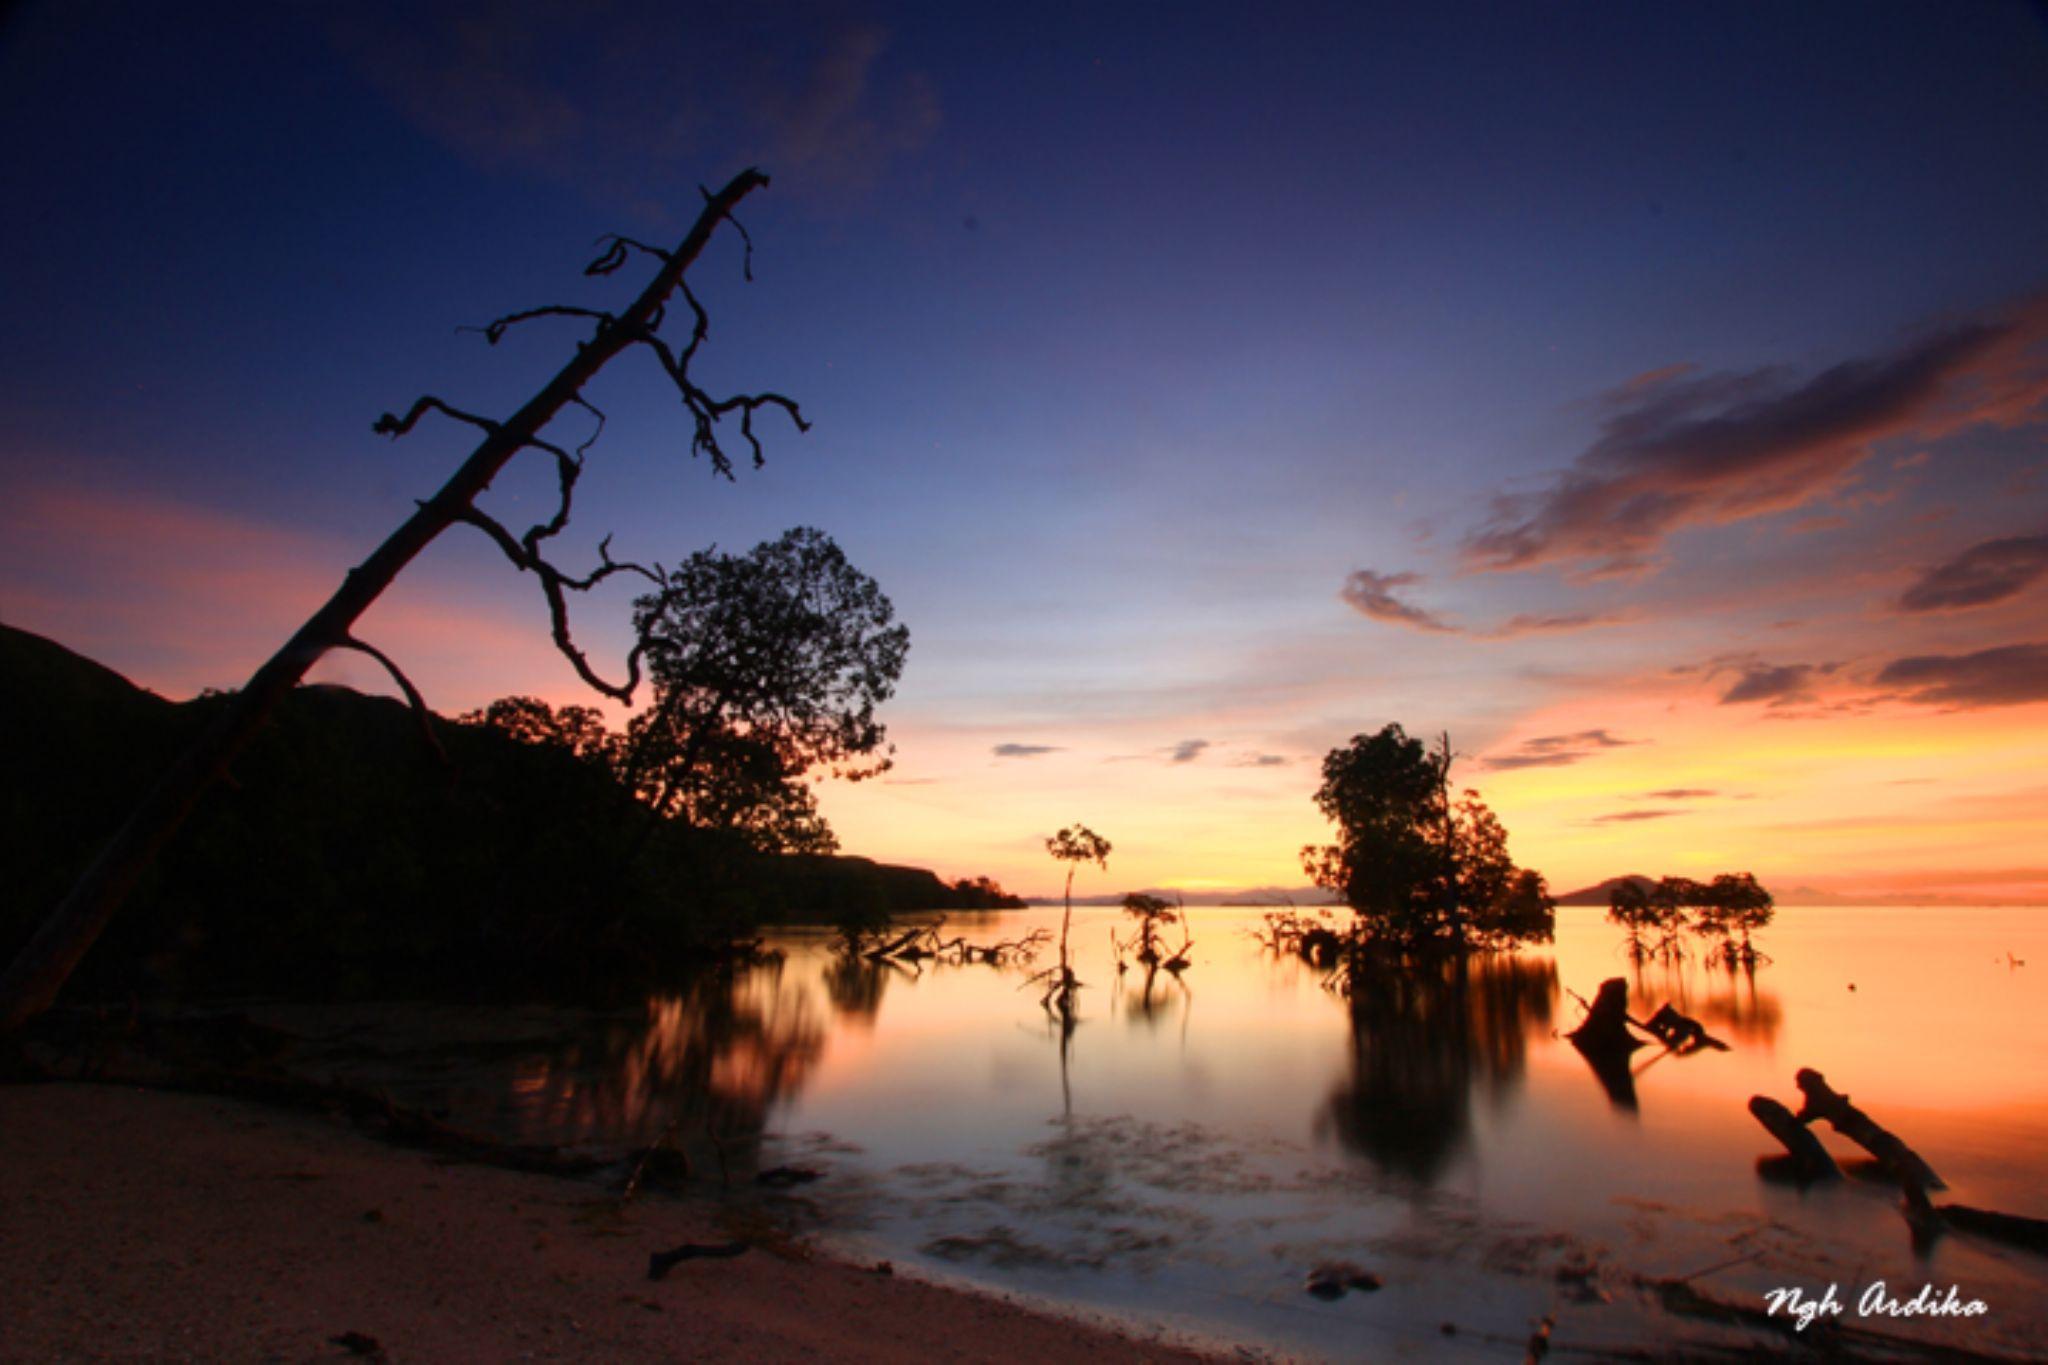 The silent sunset of Pulau Pungu, NTT, Indonesia by Ngh Ardika